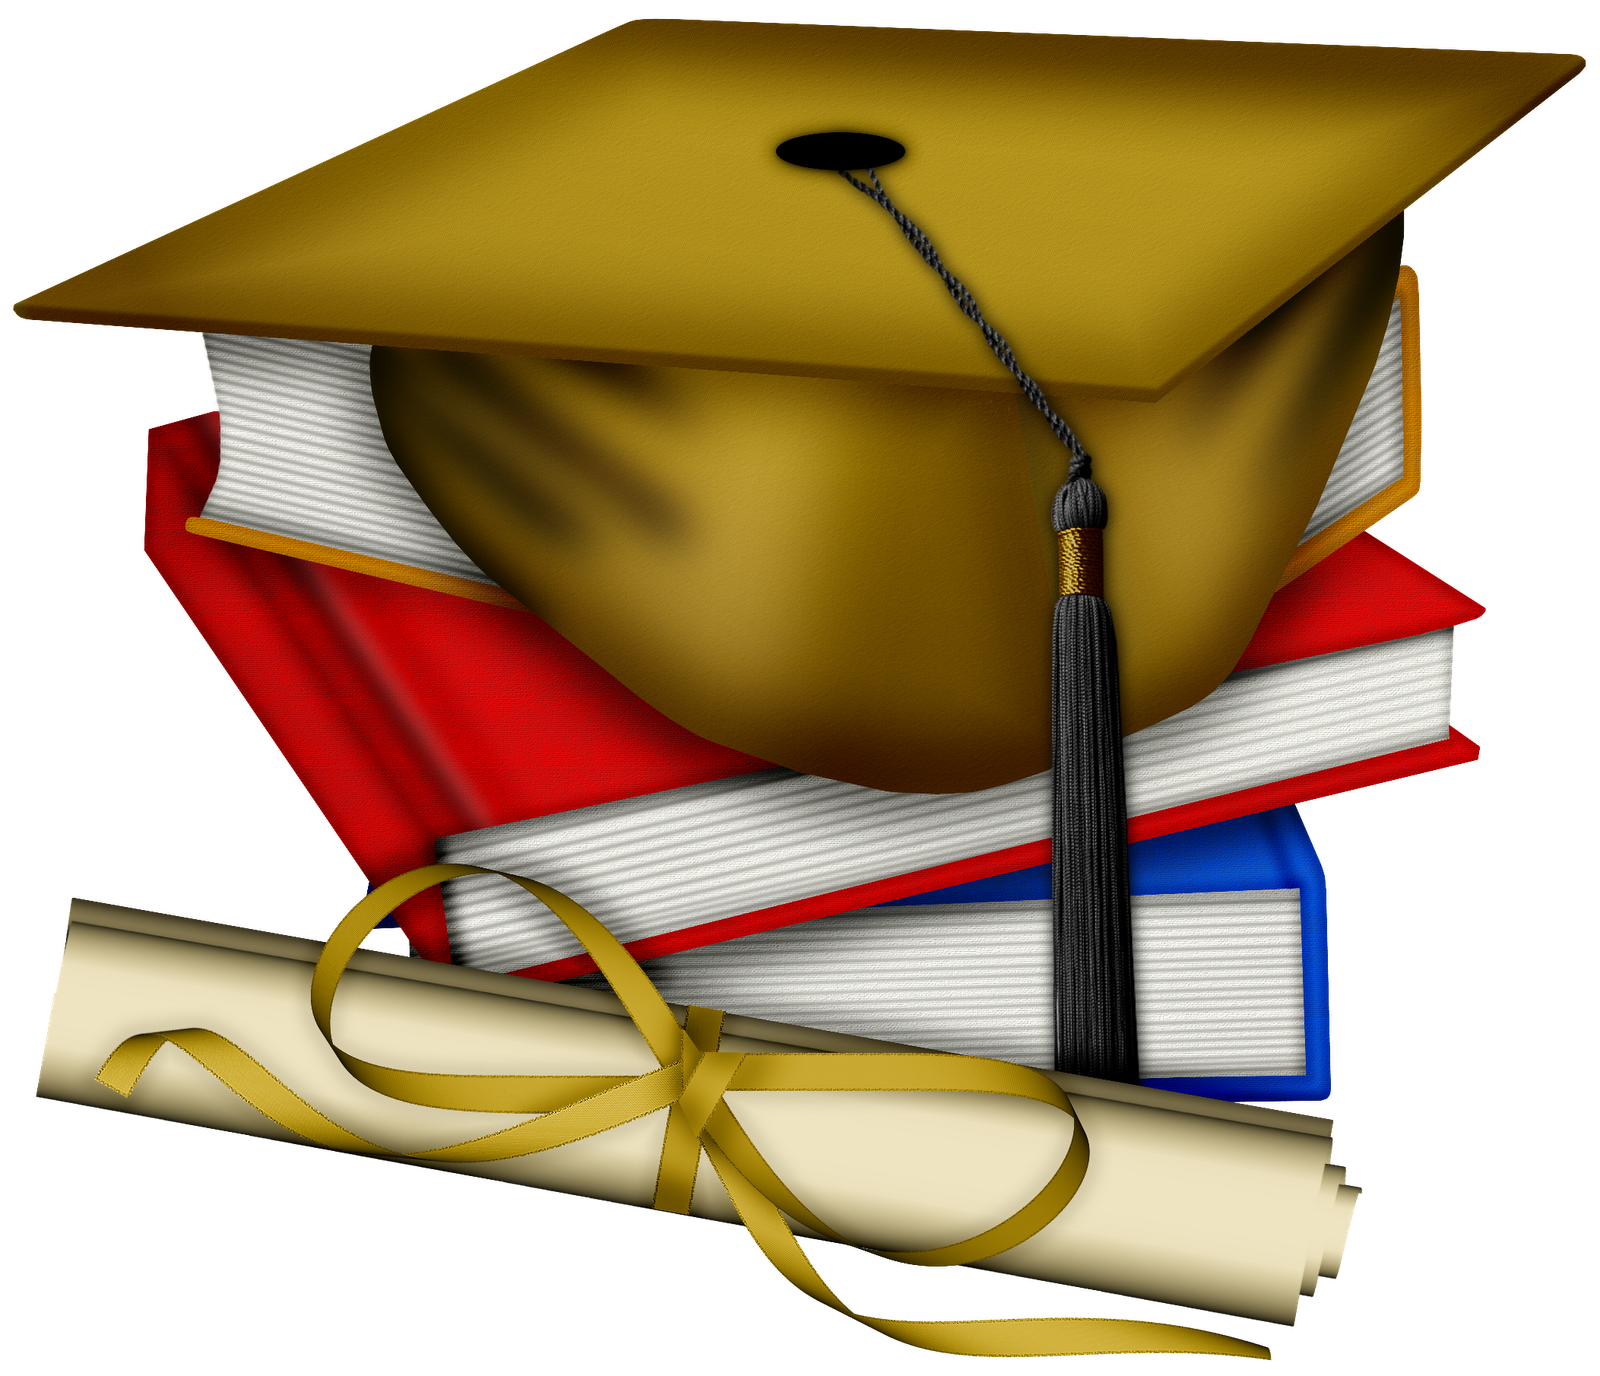 Escola formatura graduaci n. Graduate clipart collage